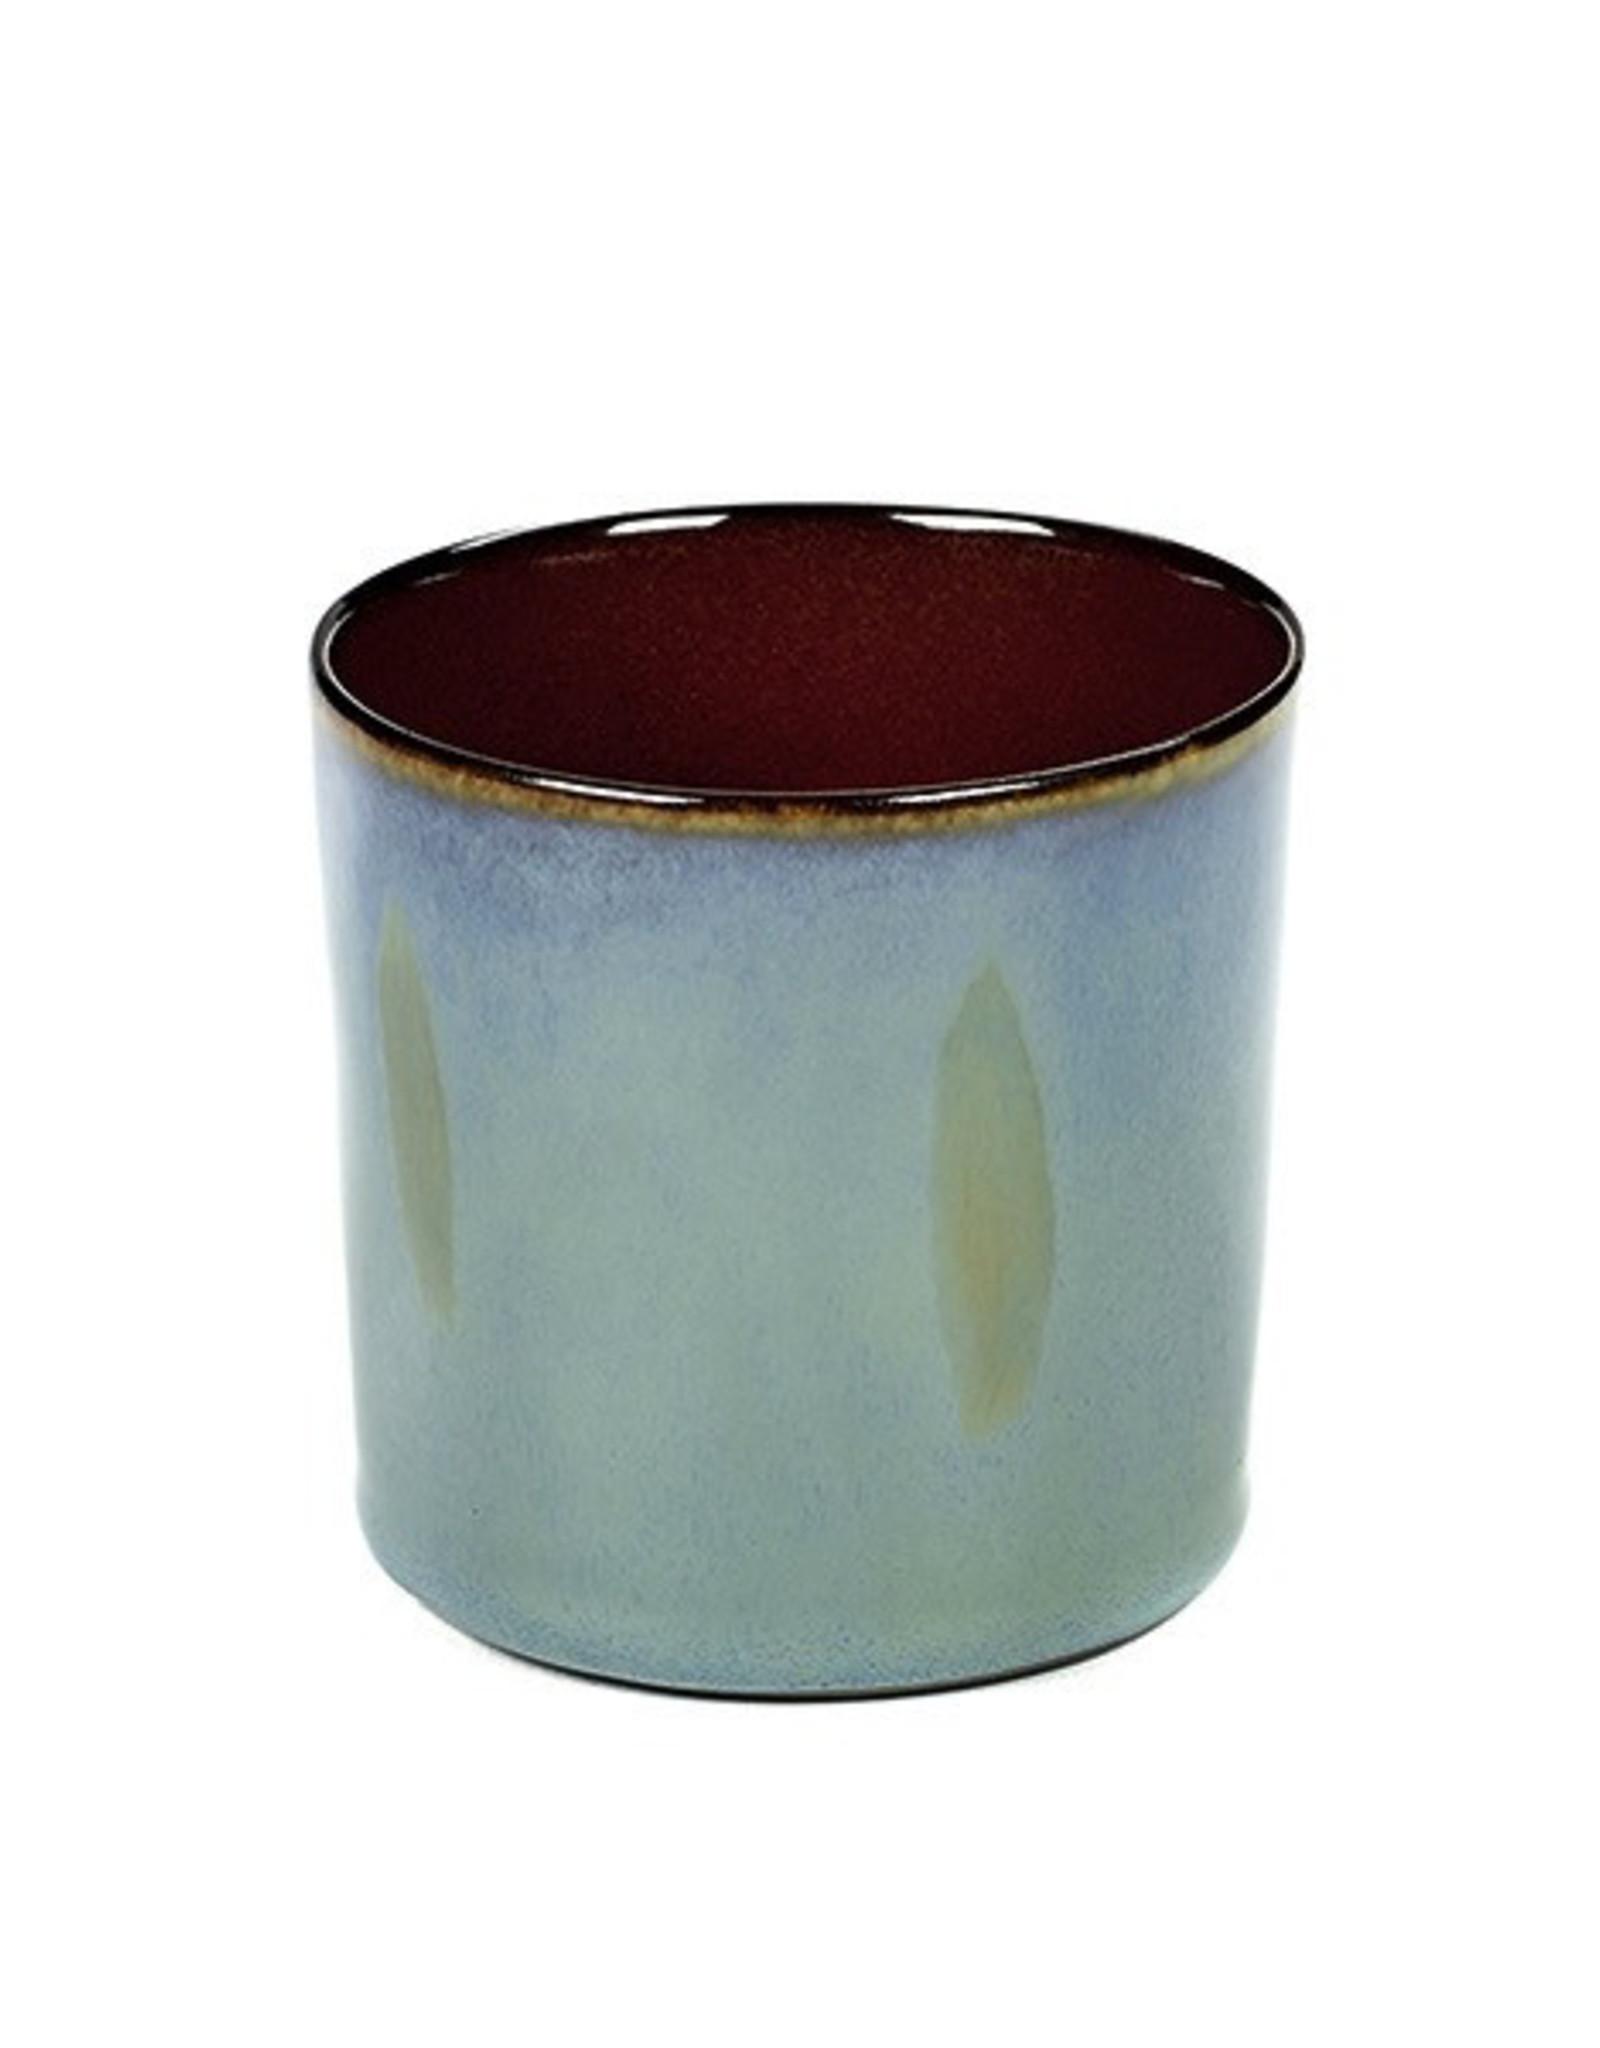 Serax NV SERAX BEKER CYLINDER HOOG SMOKEY BLUE/RUST